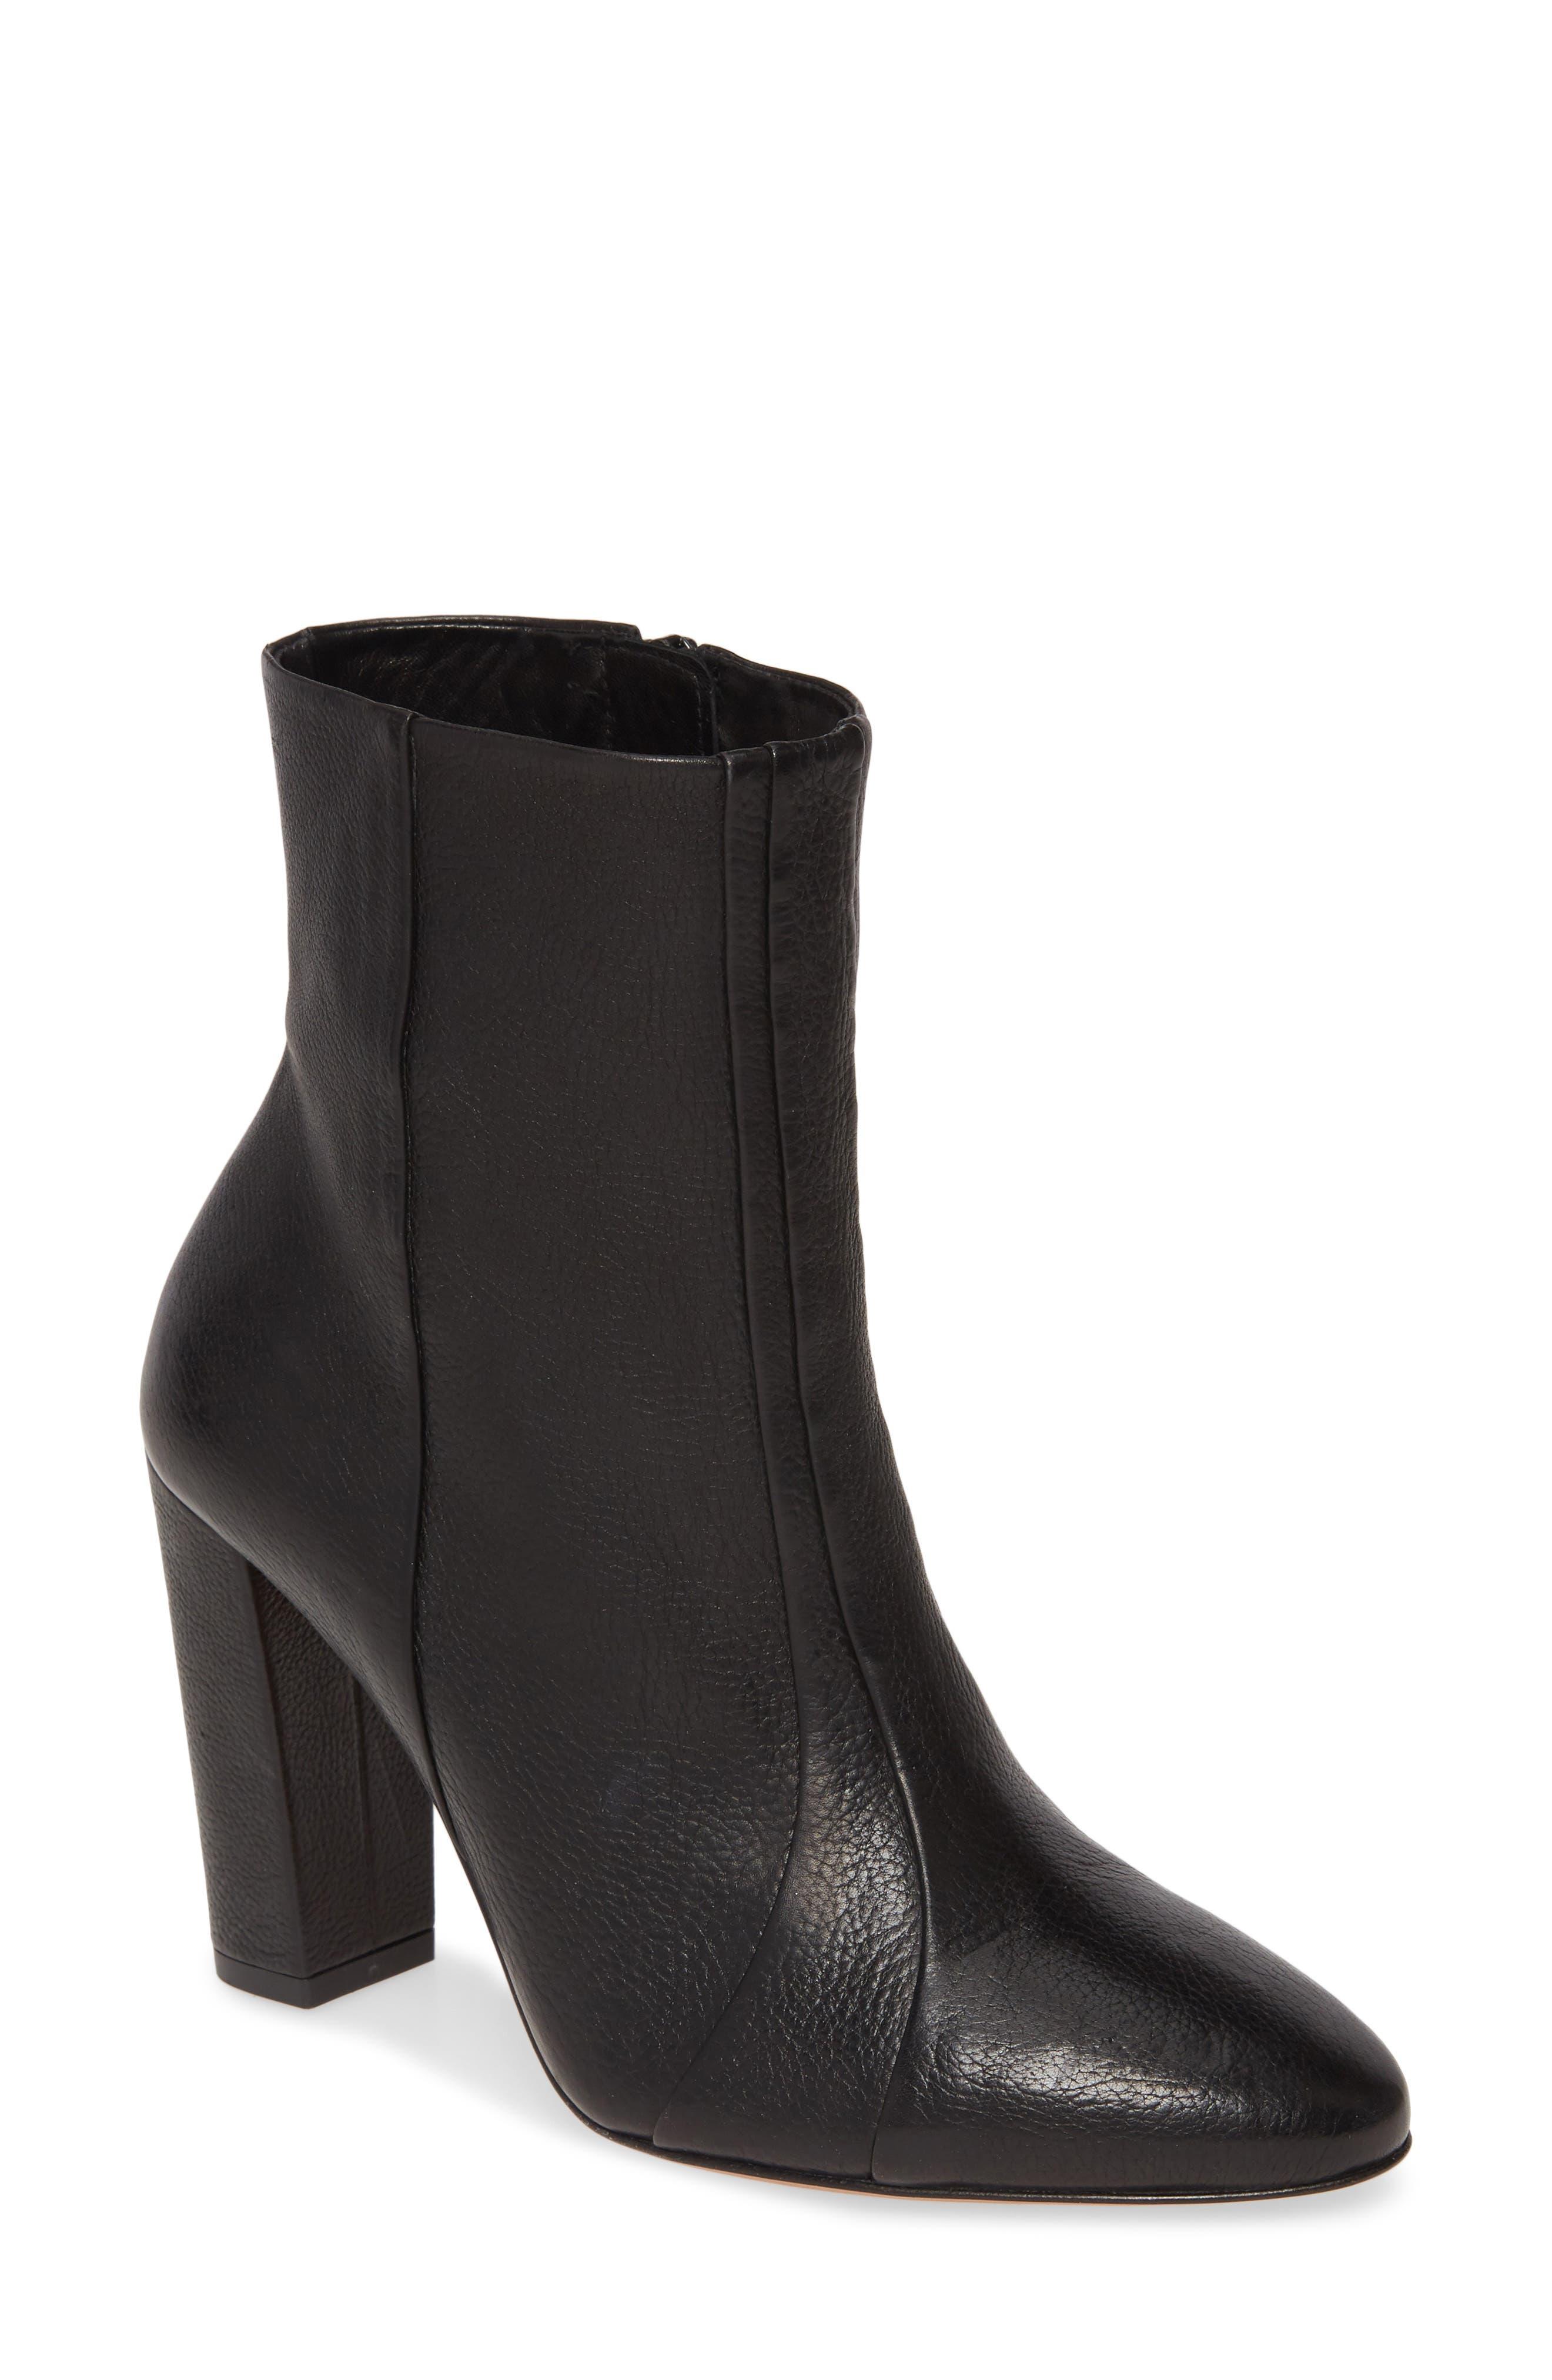 Veronica Beard Boots Marla Bootie